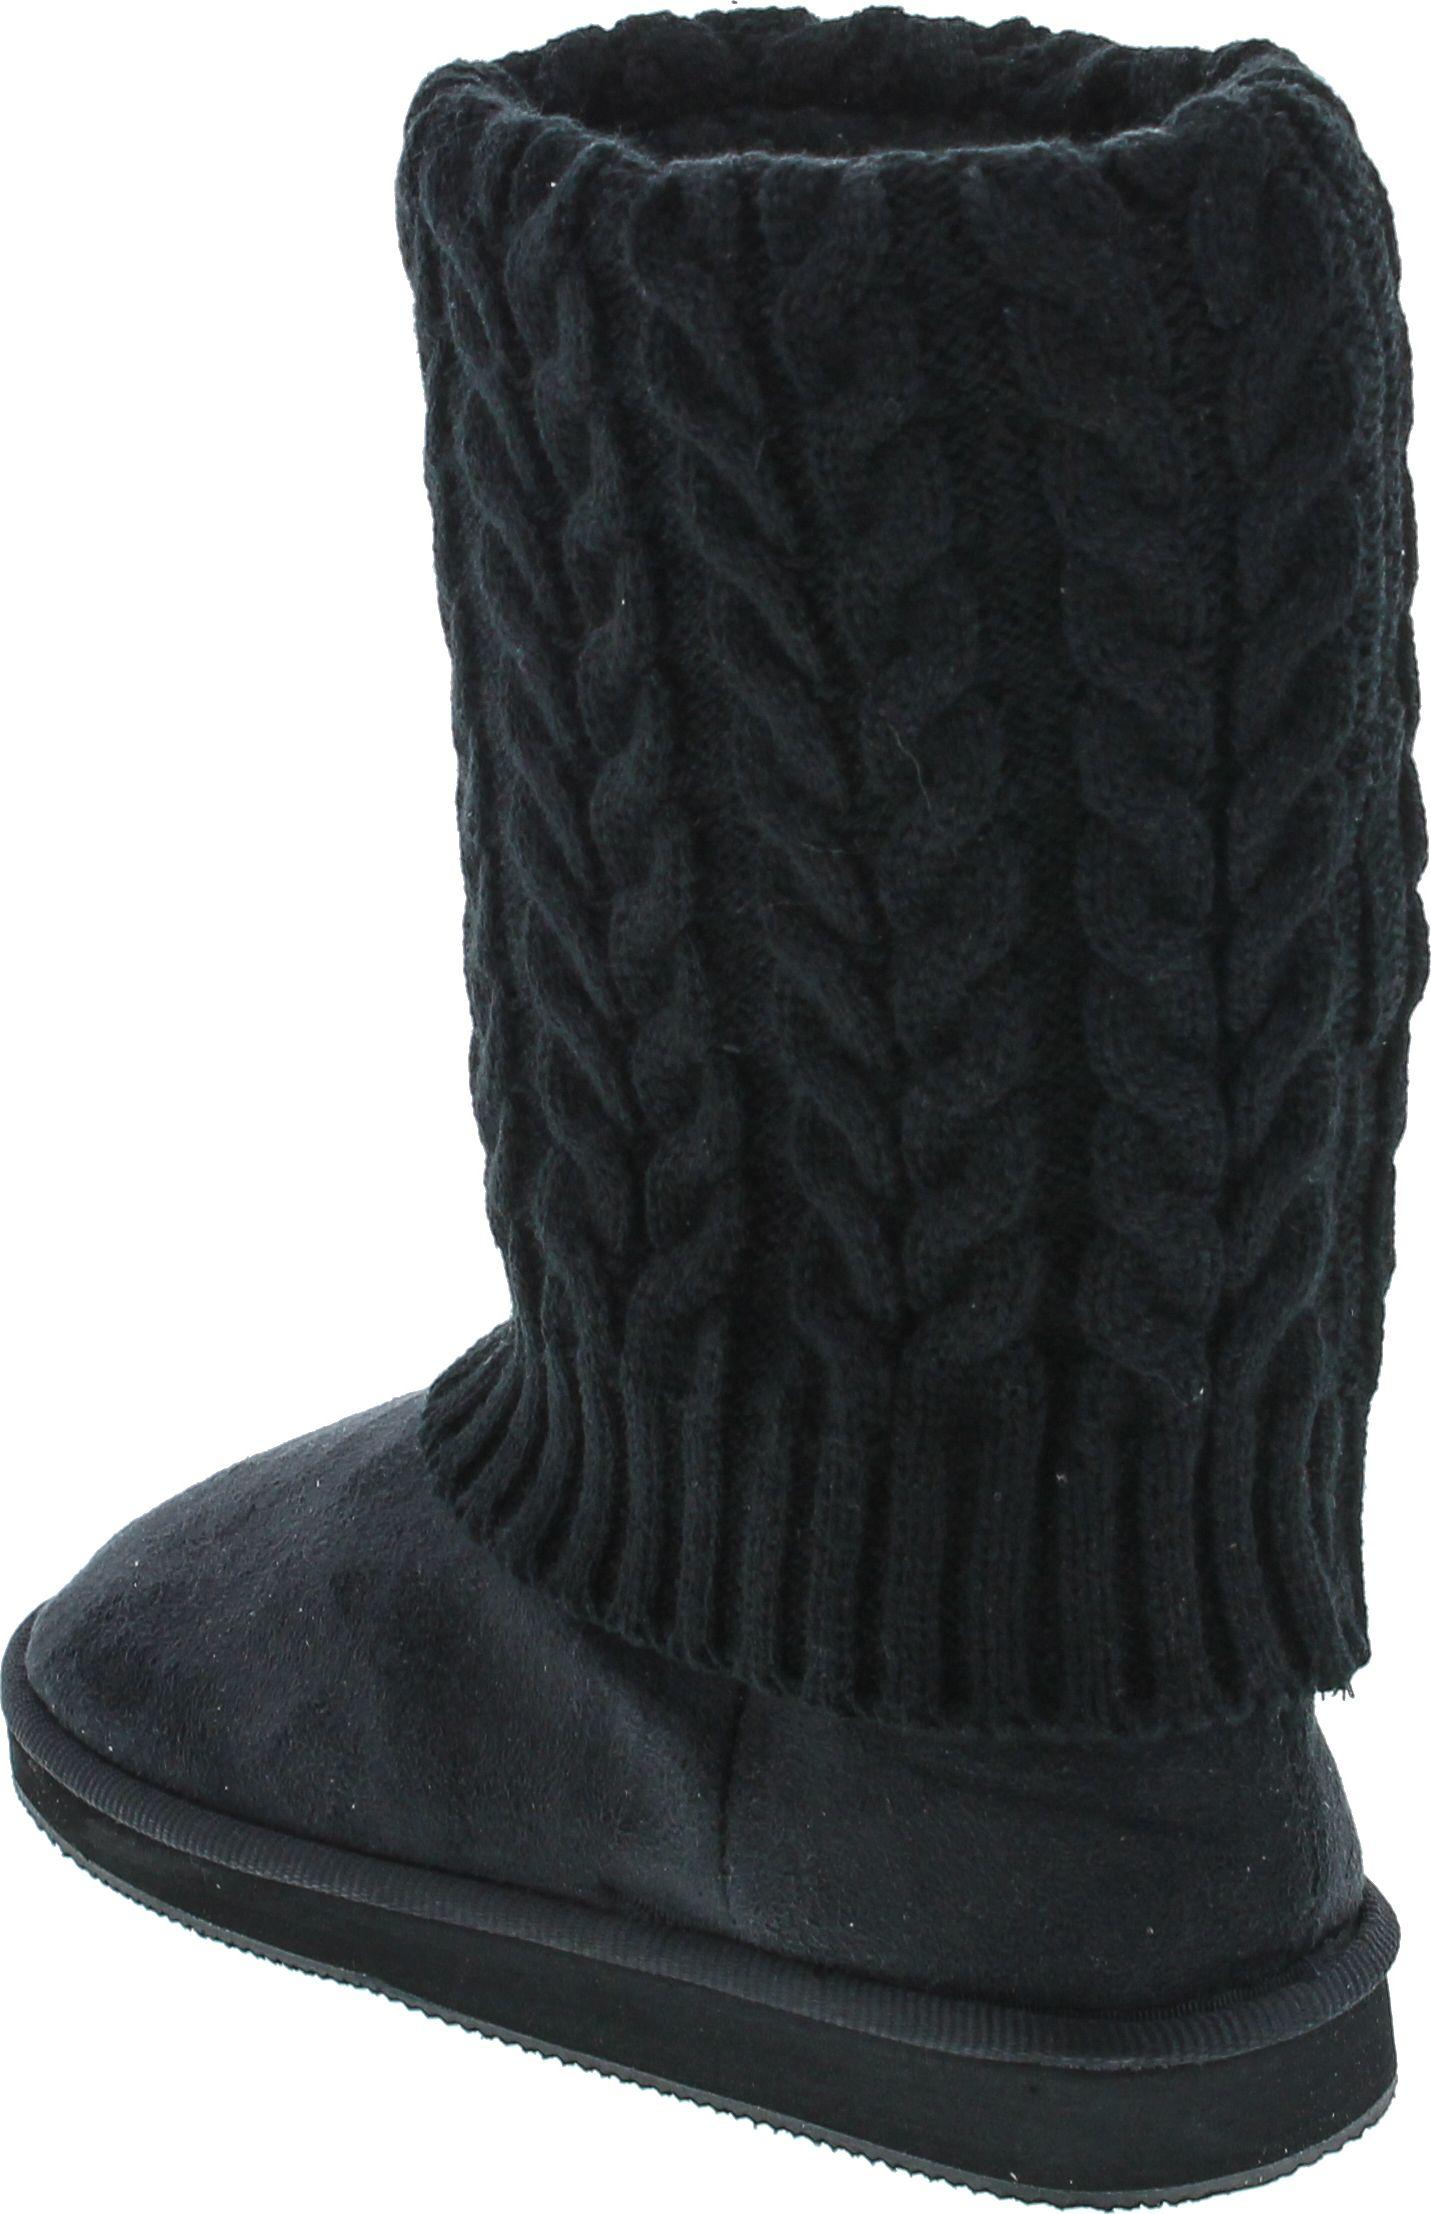 bay s rib knit sweater boot ebay